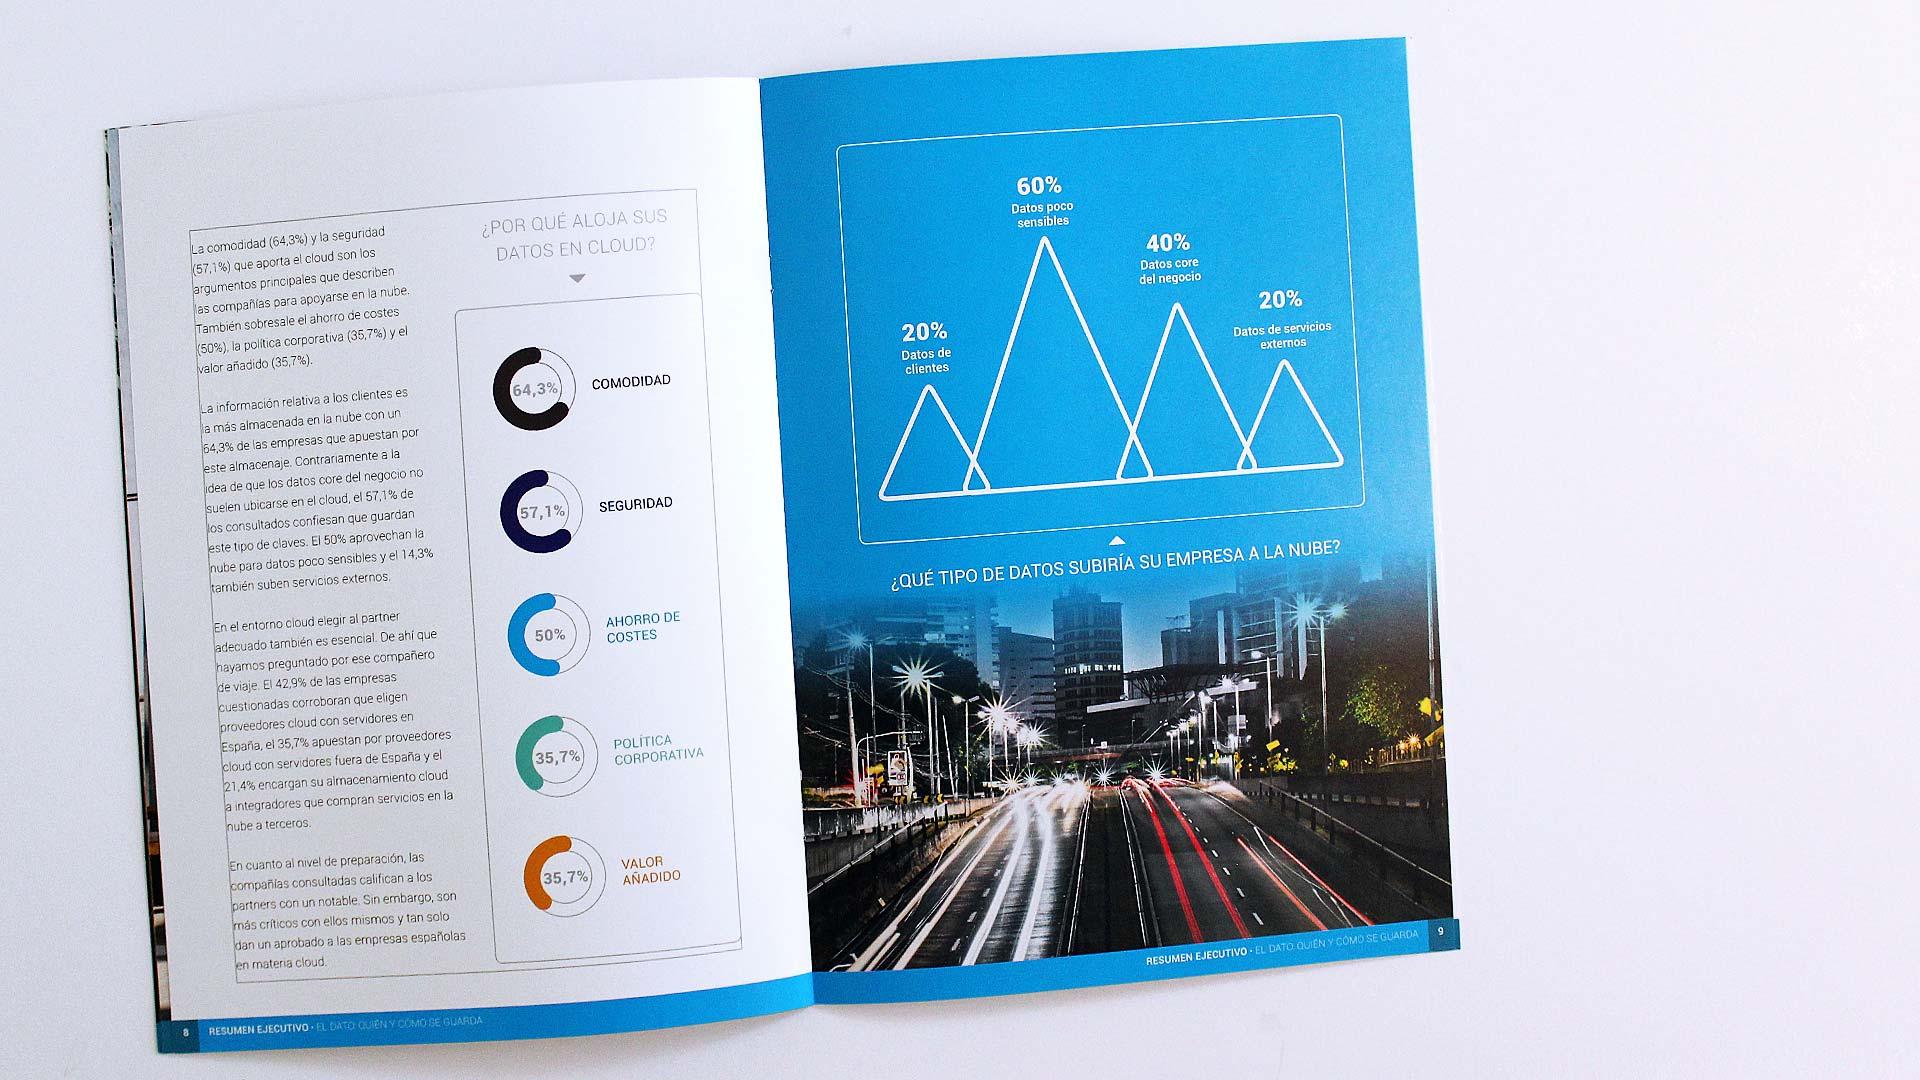 netapp-mediacloud-content-marketing-informe-resumen-ejecutivo-ebook-2017-06